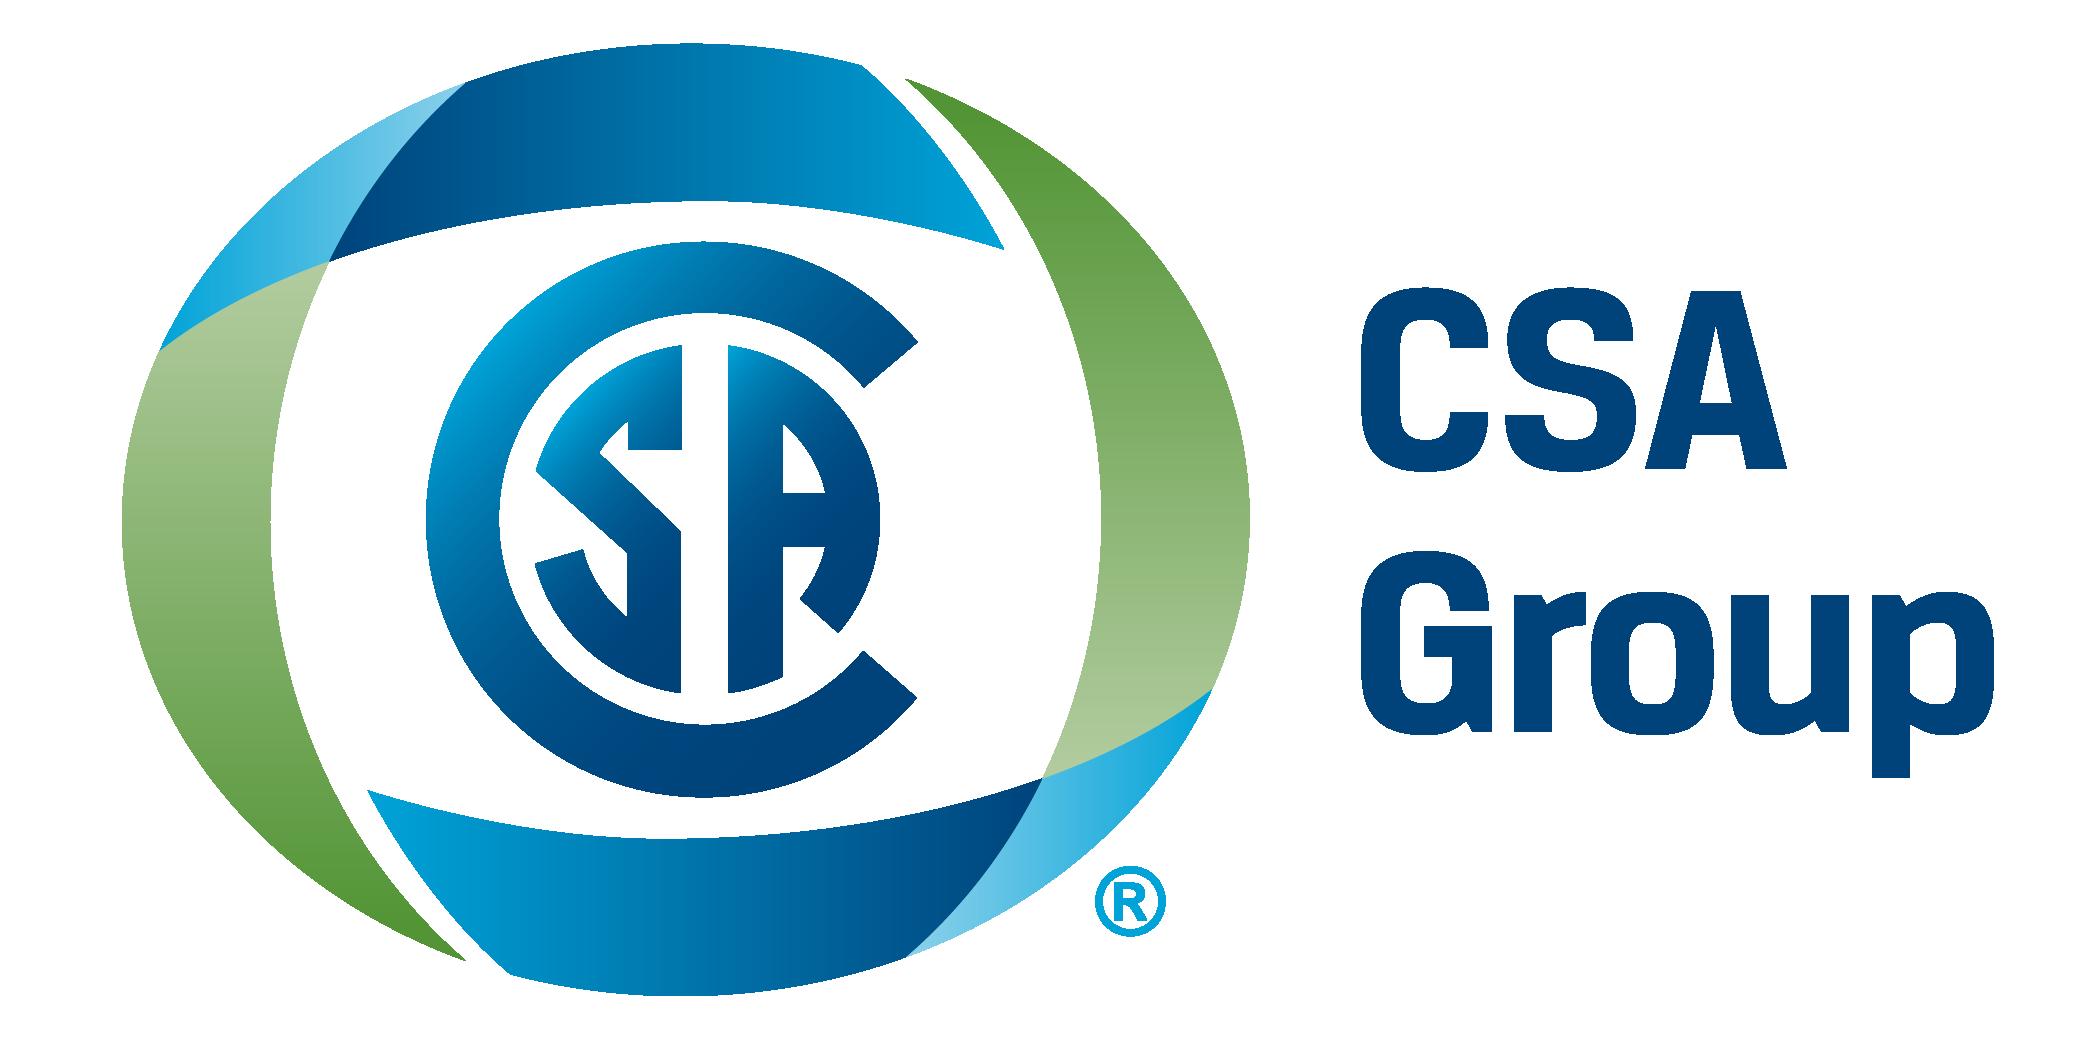 GSA Group